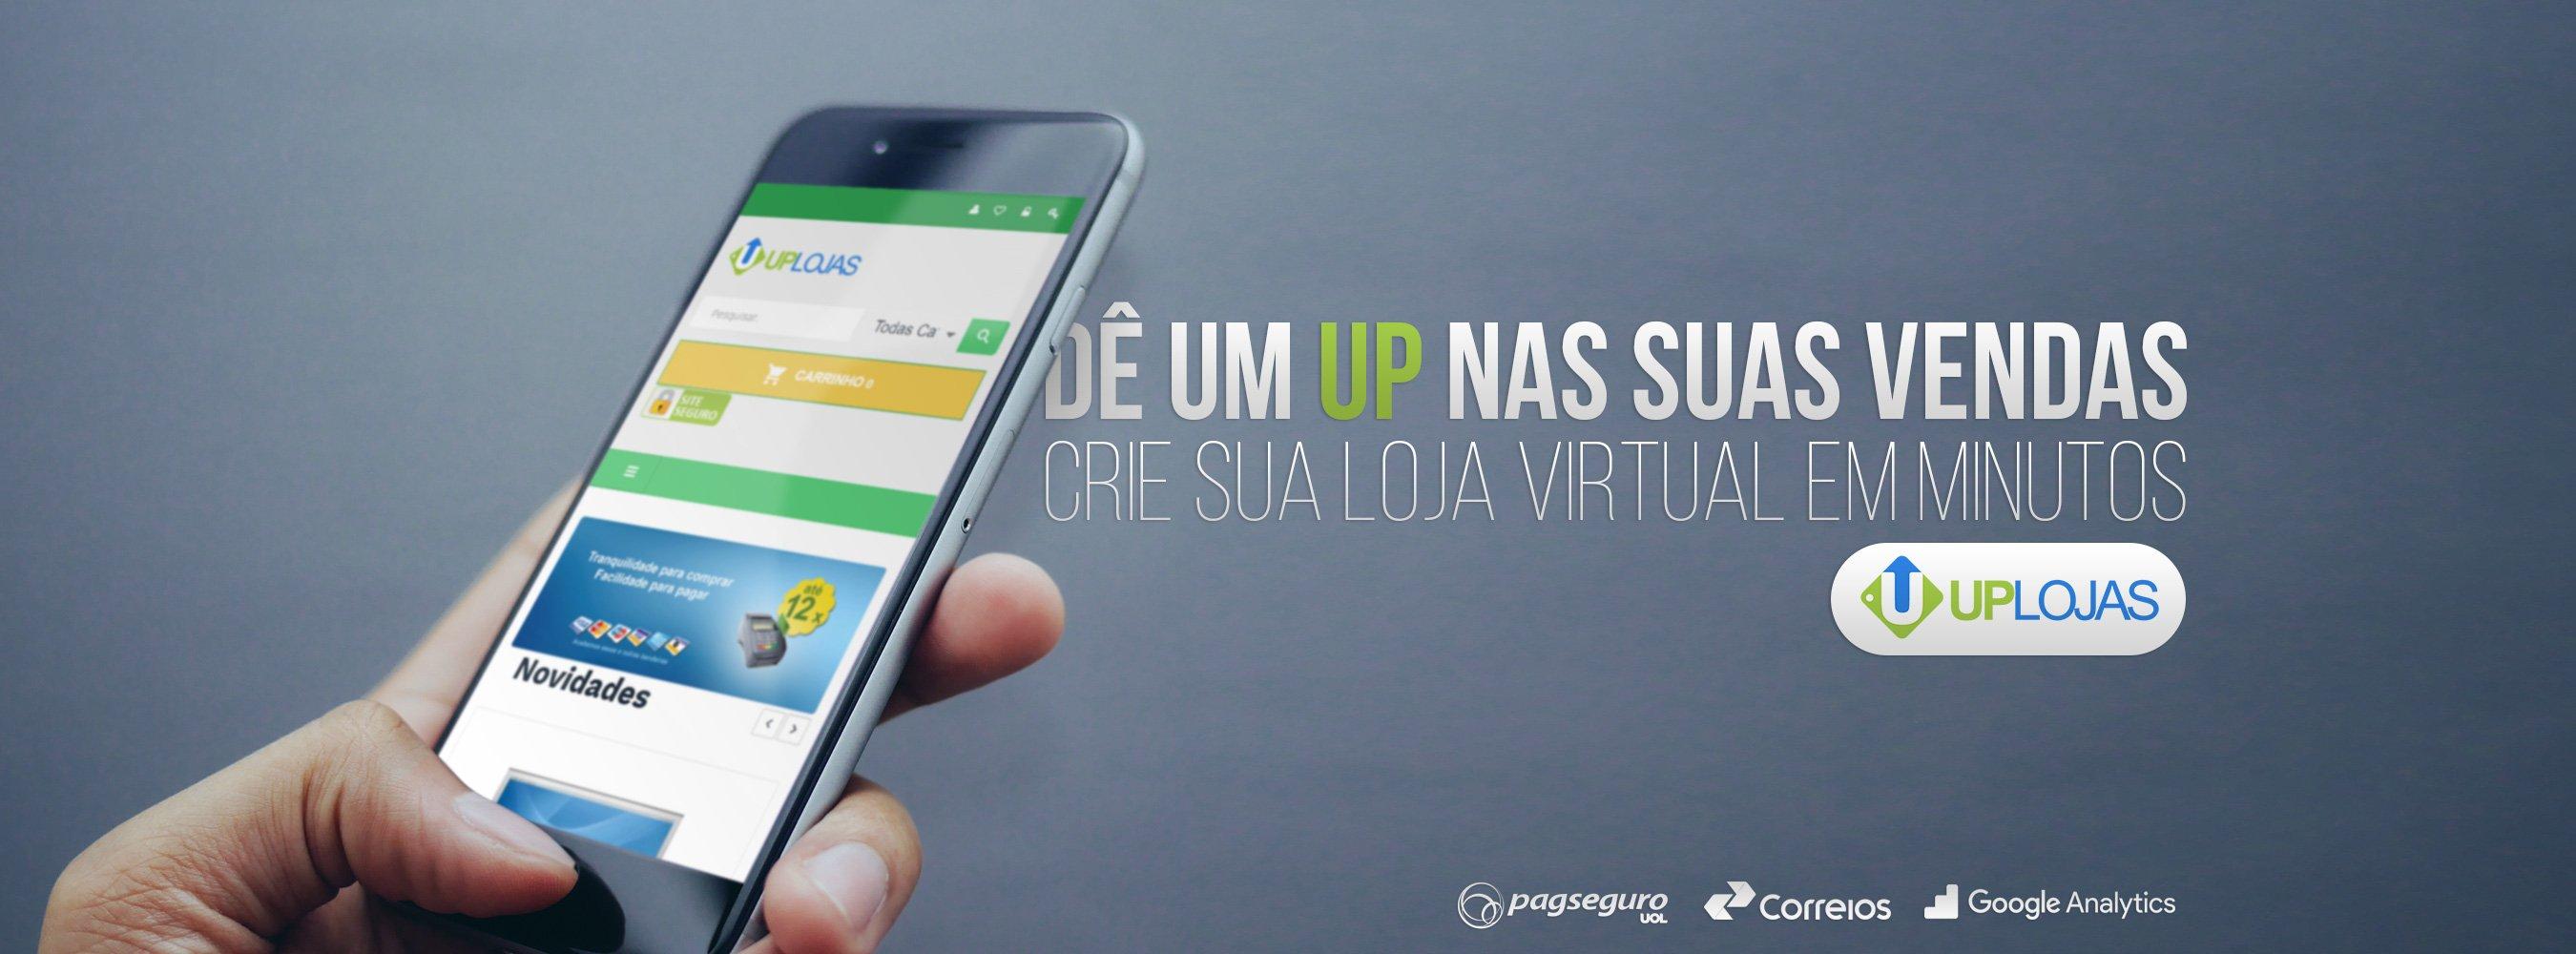 UP Lojas Sistema E-commerce